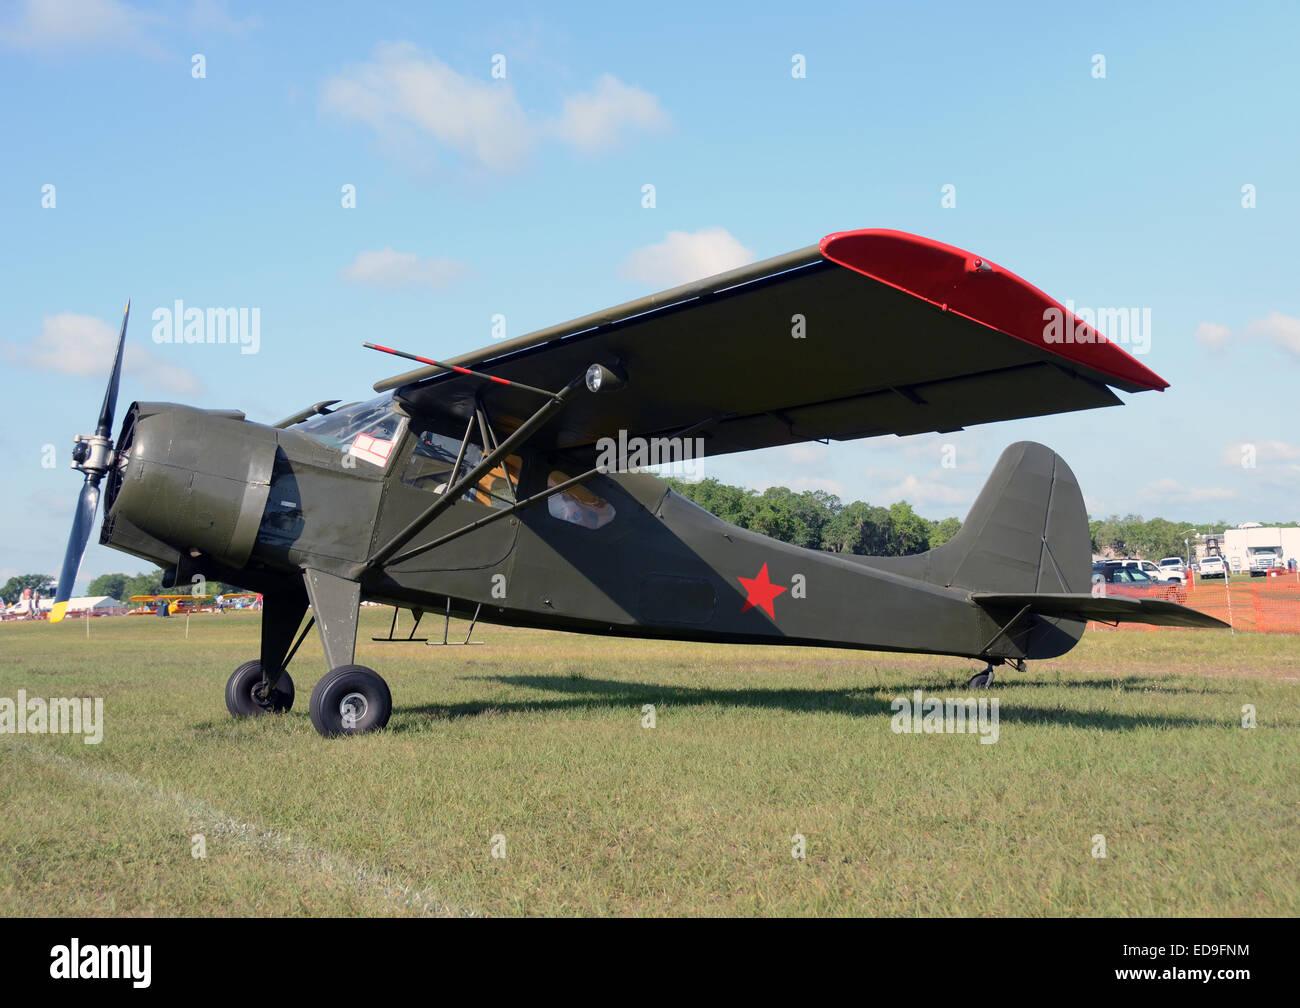 Retro-Propellerflugzeug in Tarnfarben Stockbild